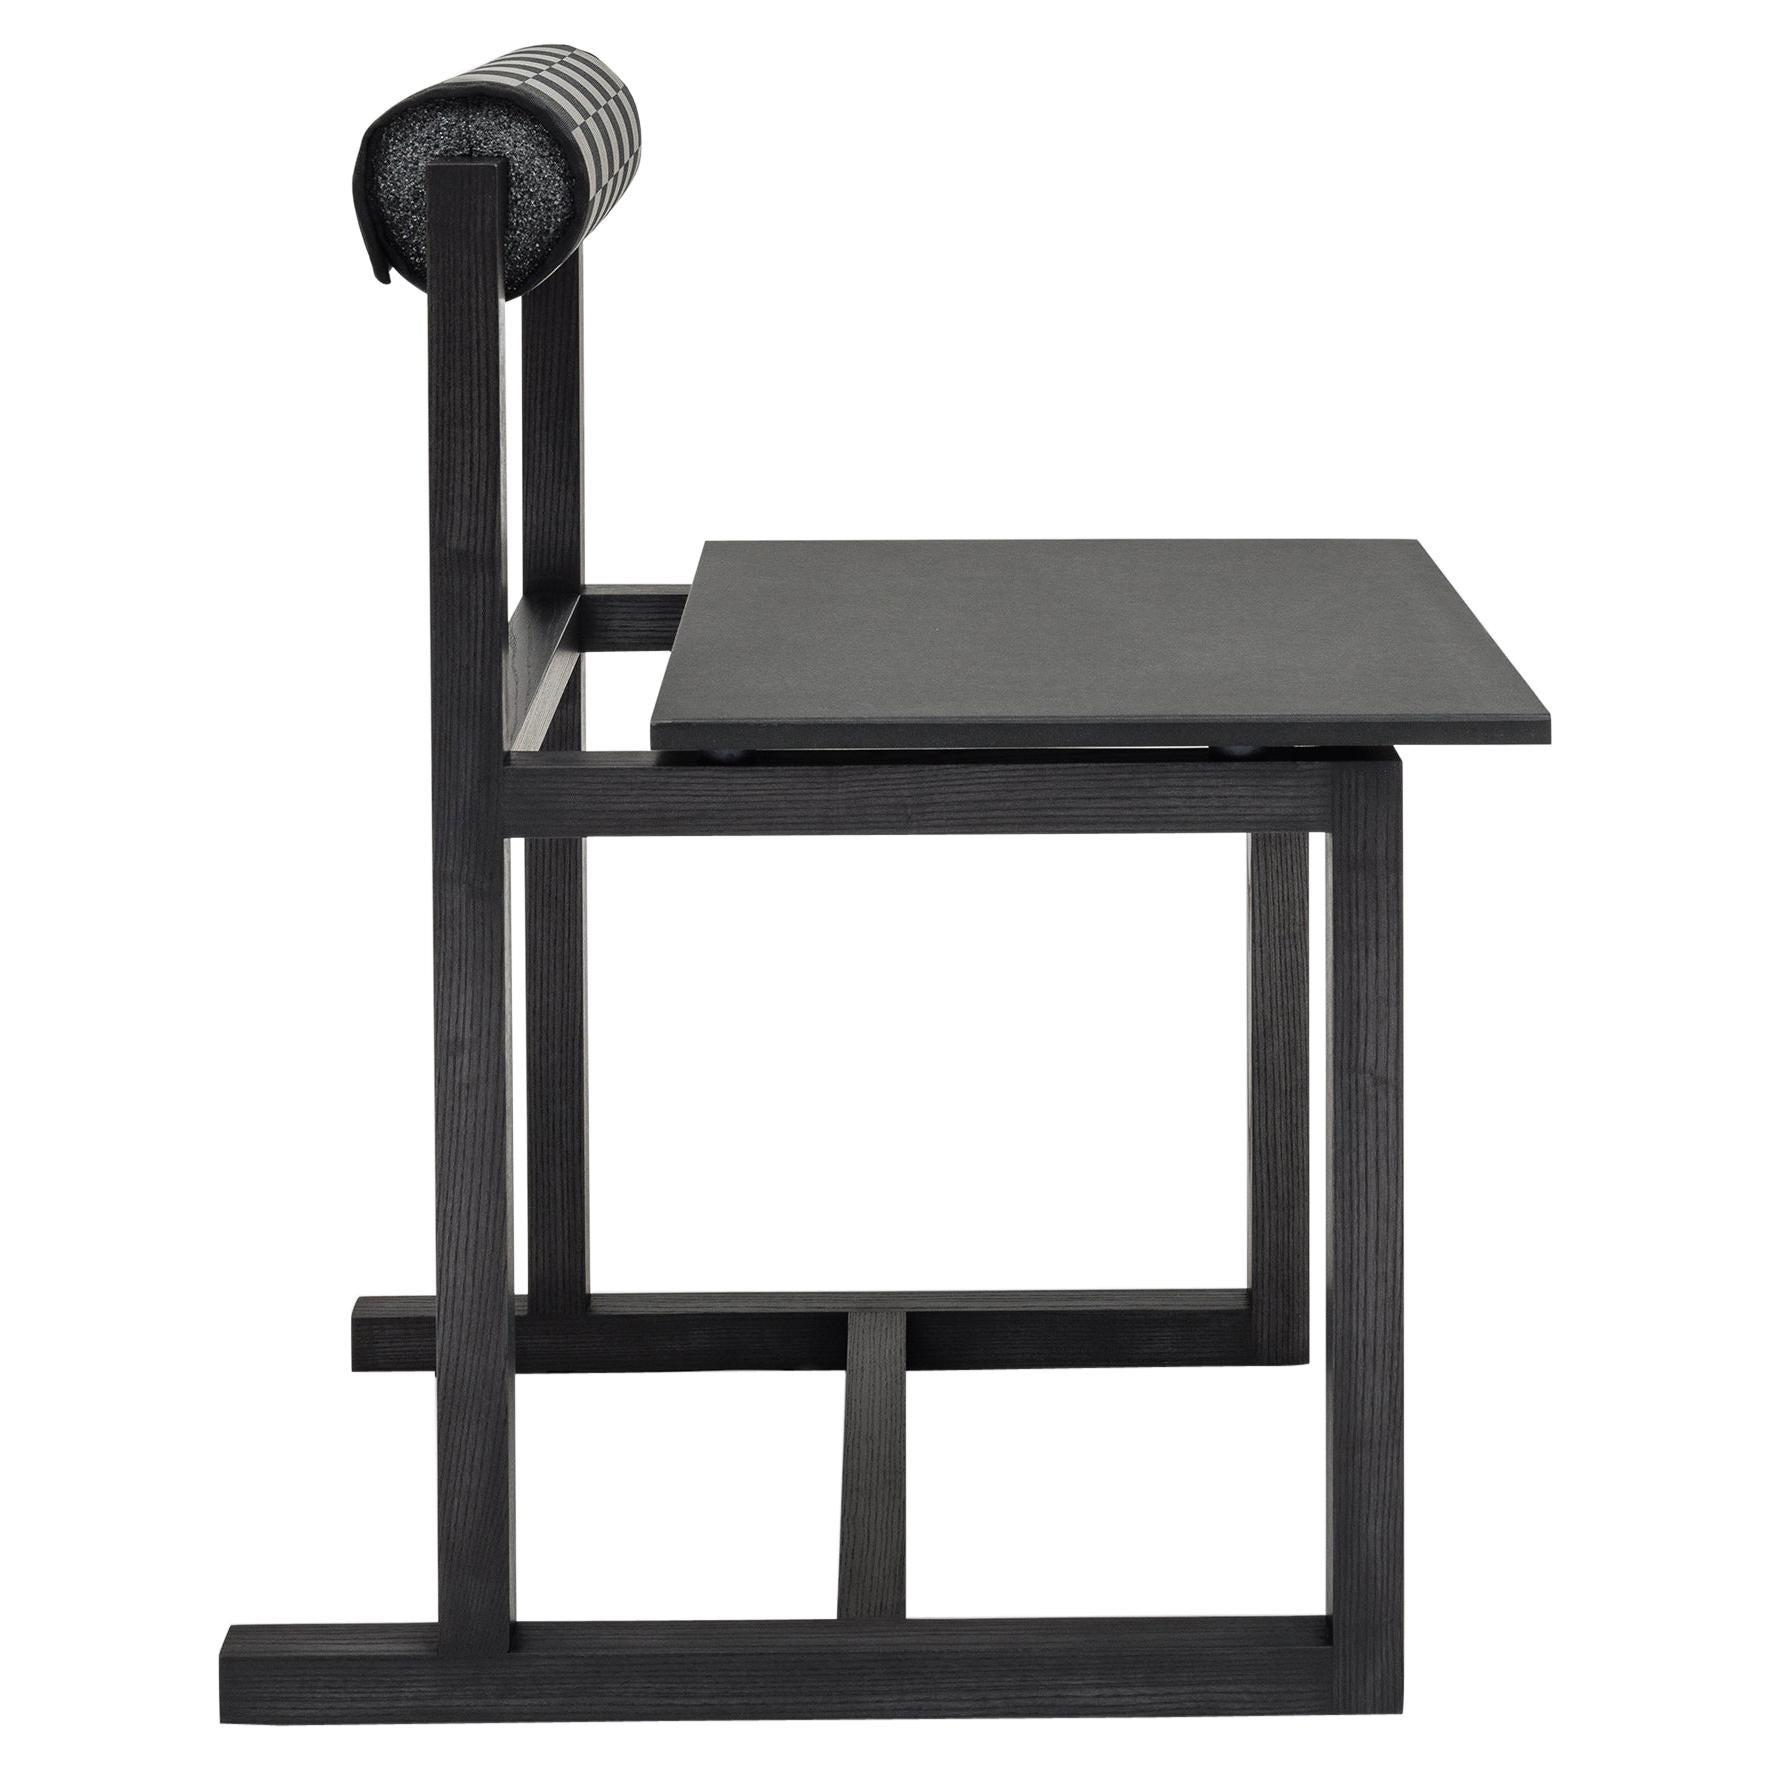 Judd-Nelson Modern Chair in Ebonized Ash Wood